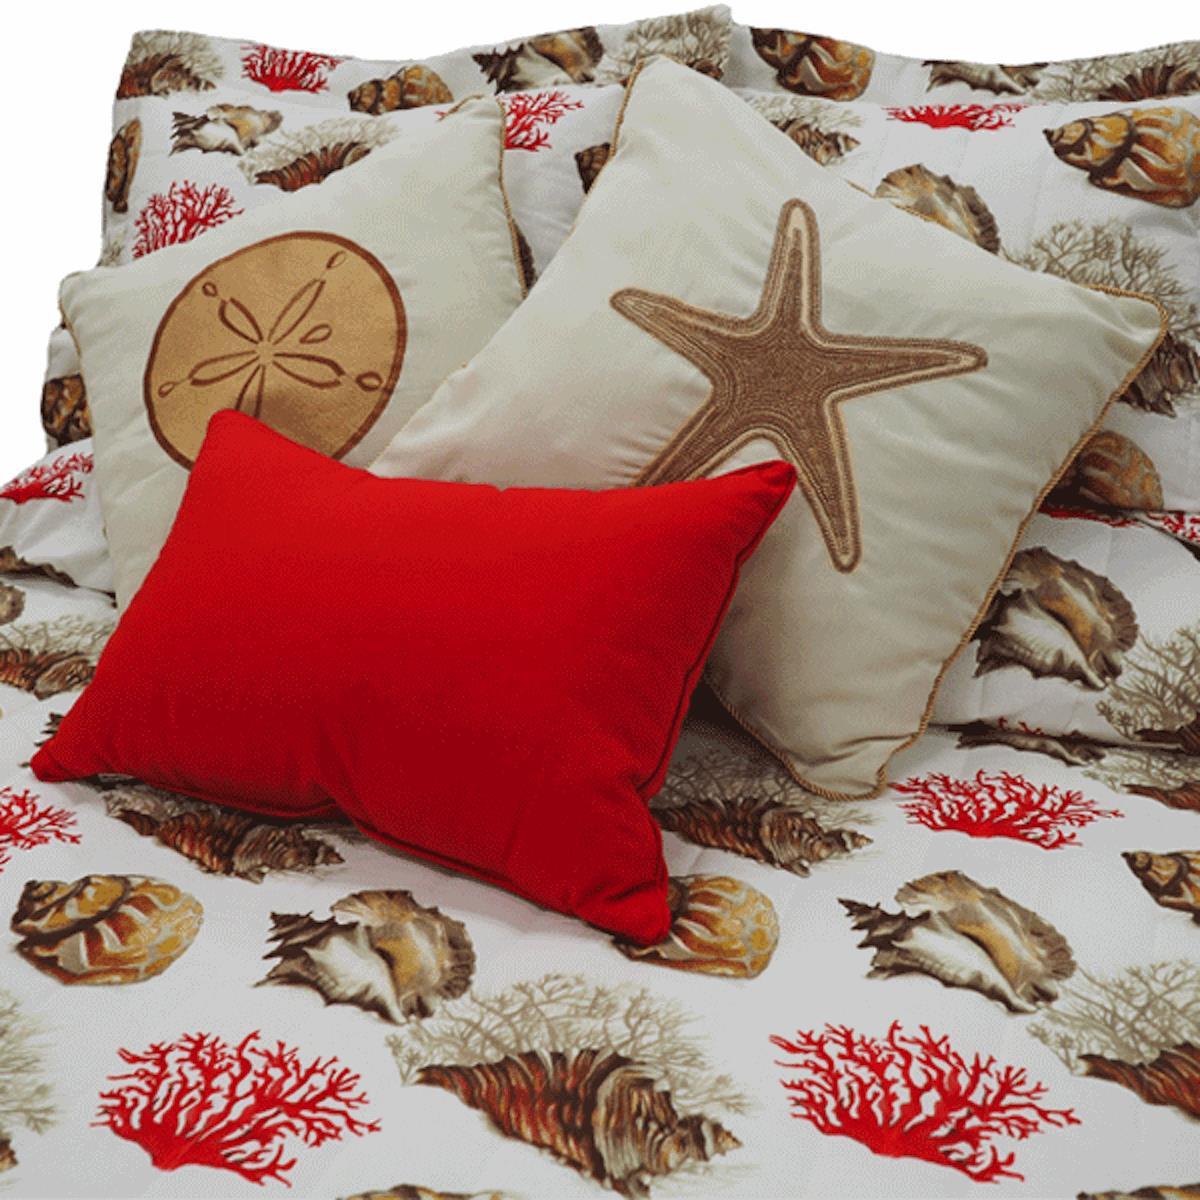 Buccin Natural Bedding Collection -